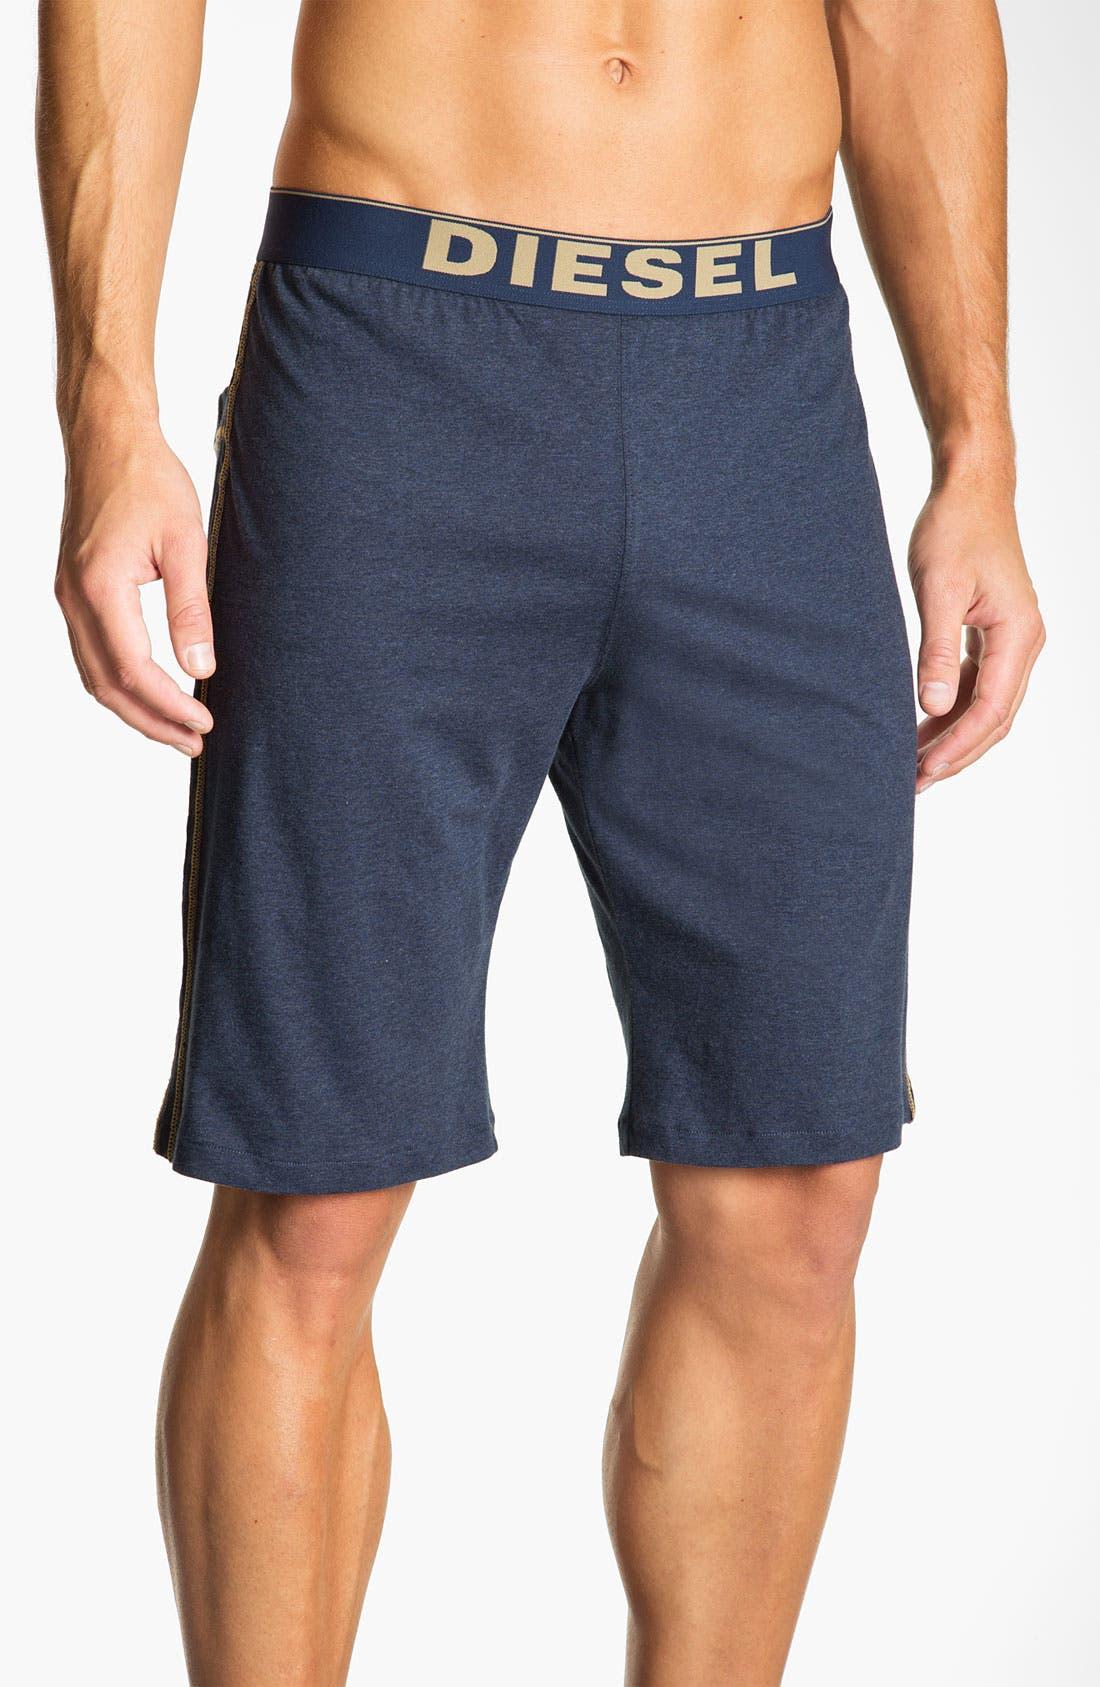 Alternate Image 1 Selected - DIESEL® 'Hans' Lounge Shorts